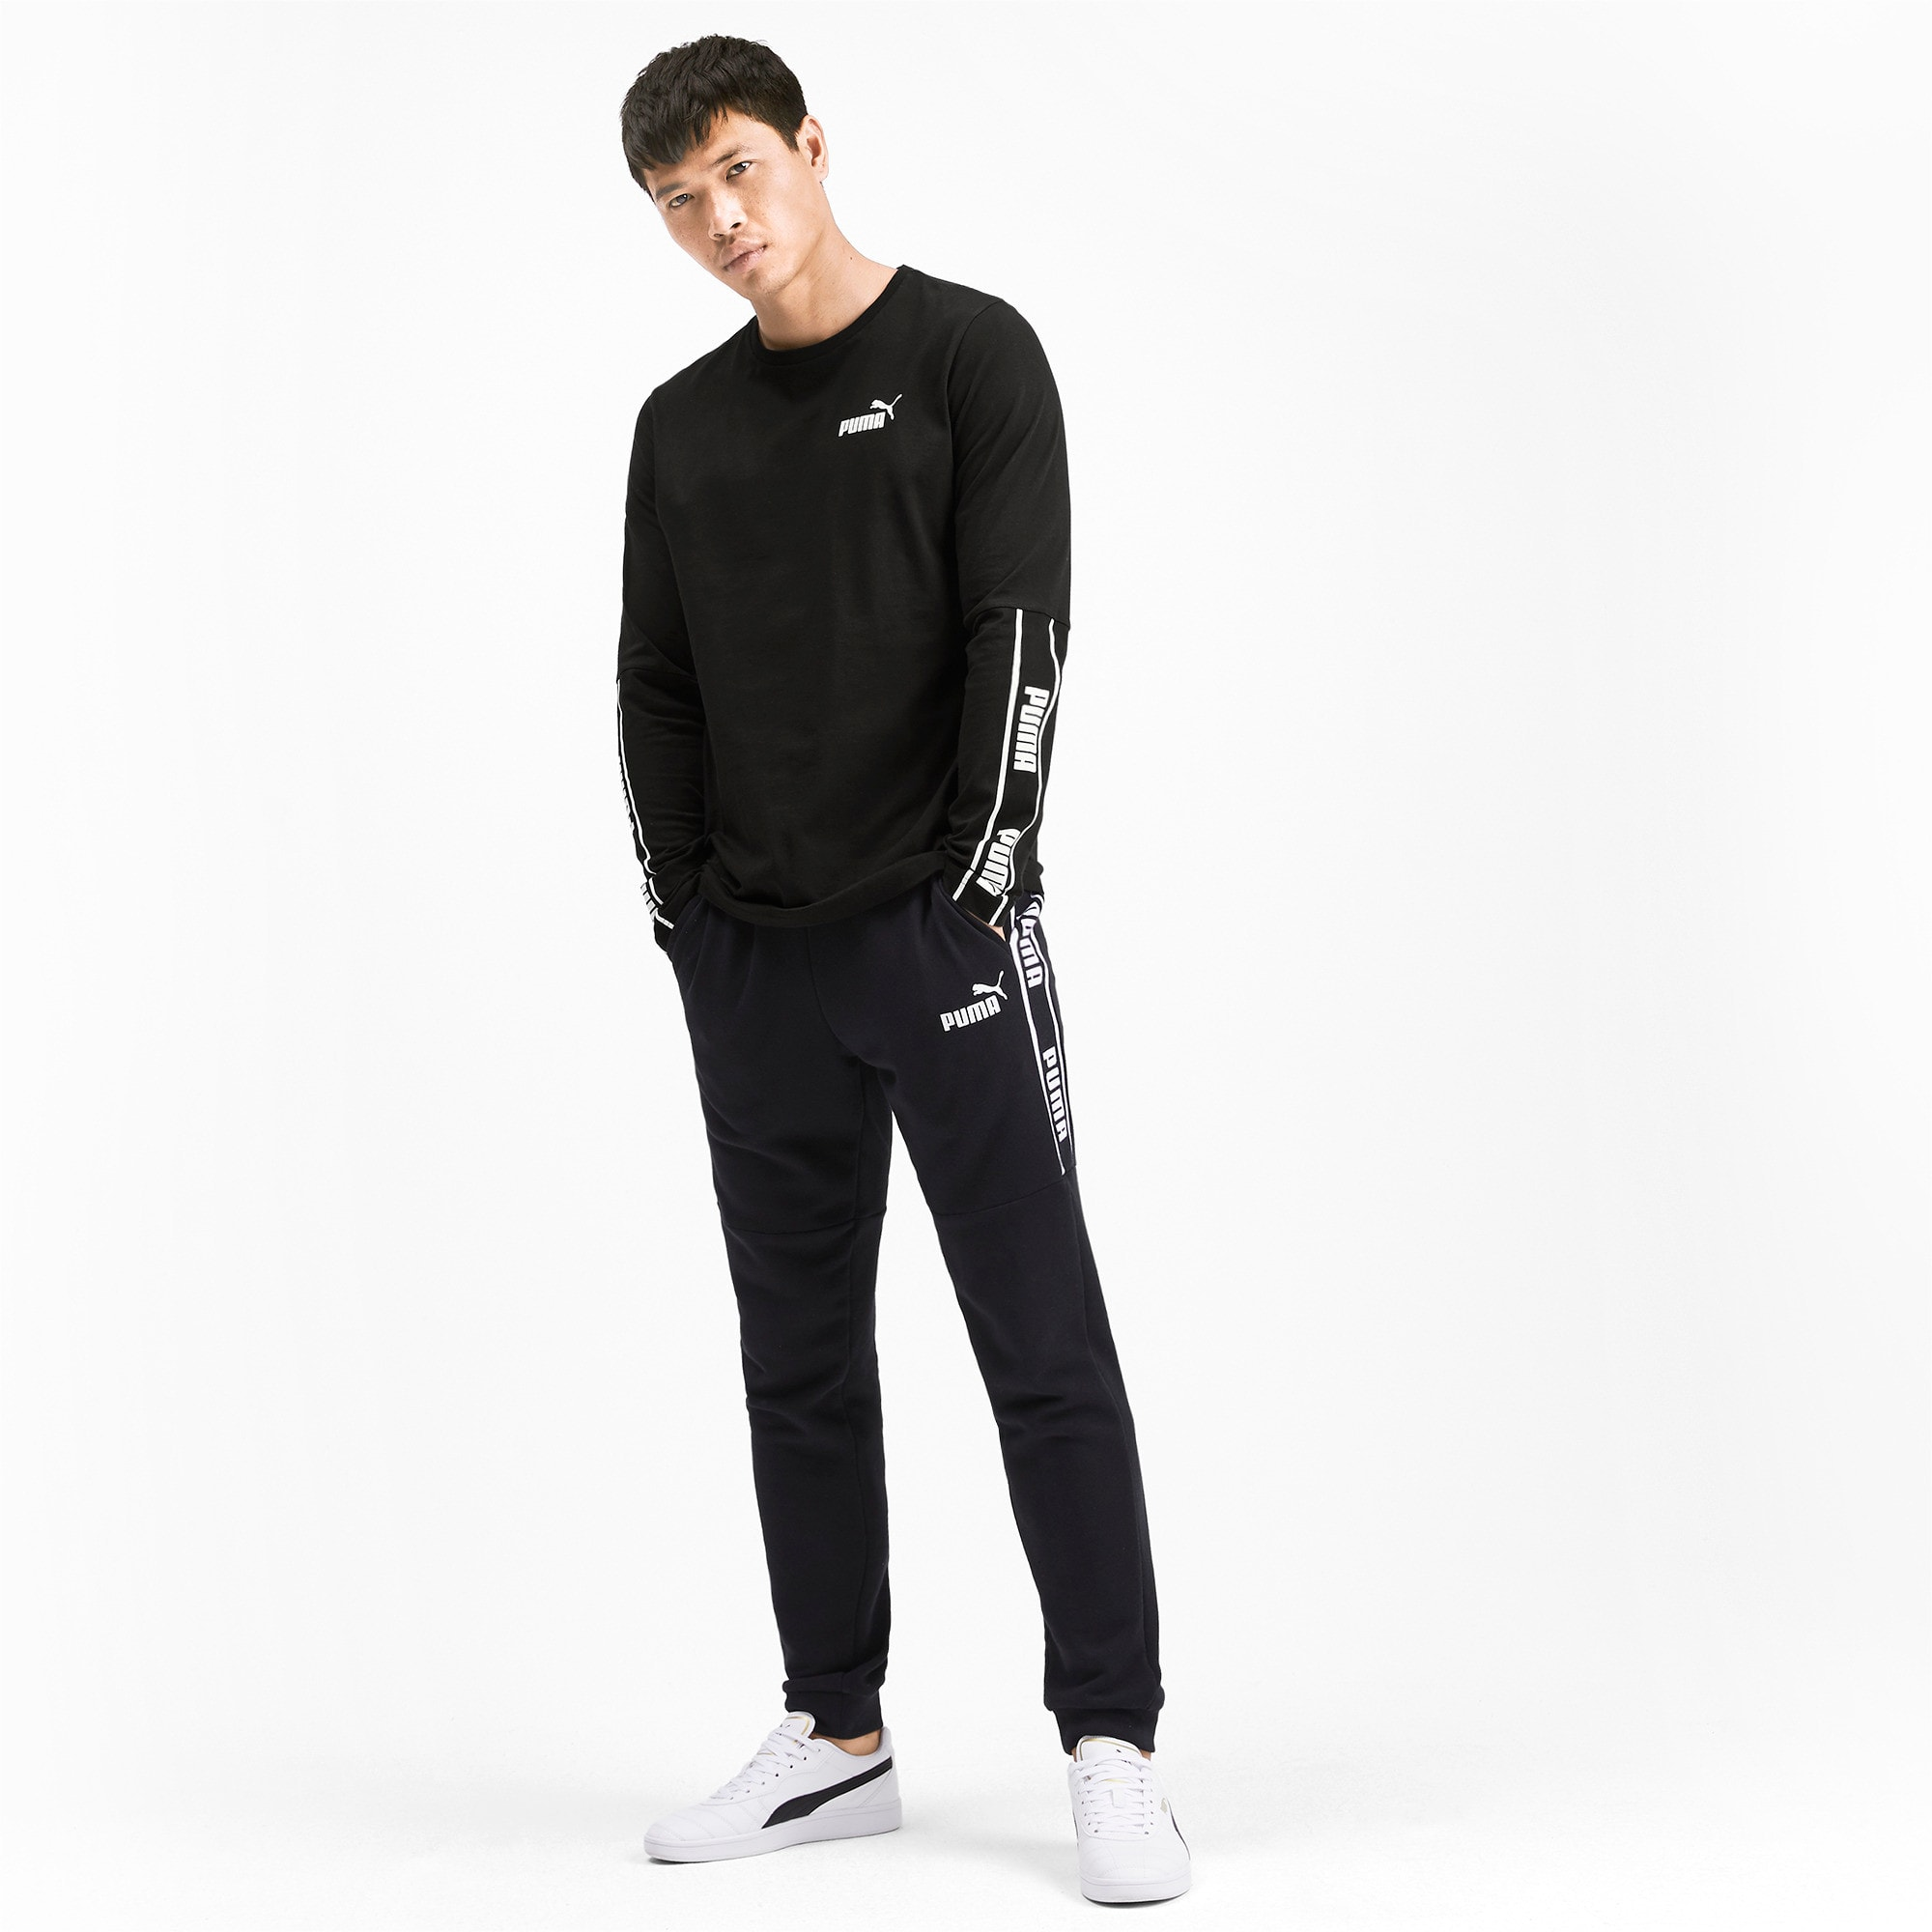 Miniatura 4 de Camiseta de mangas largas Amplified para hombre, Puma Black, mediano